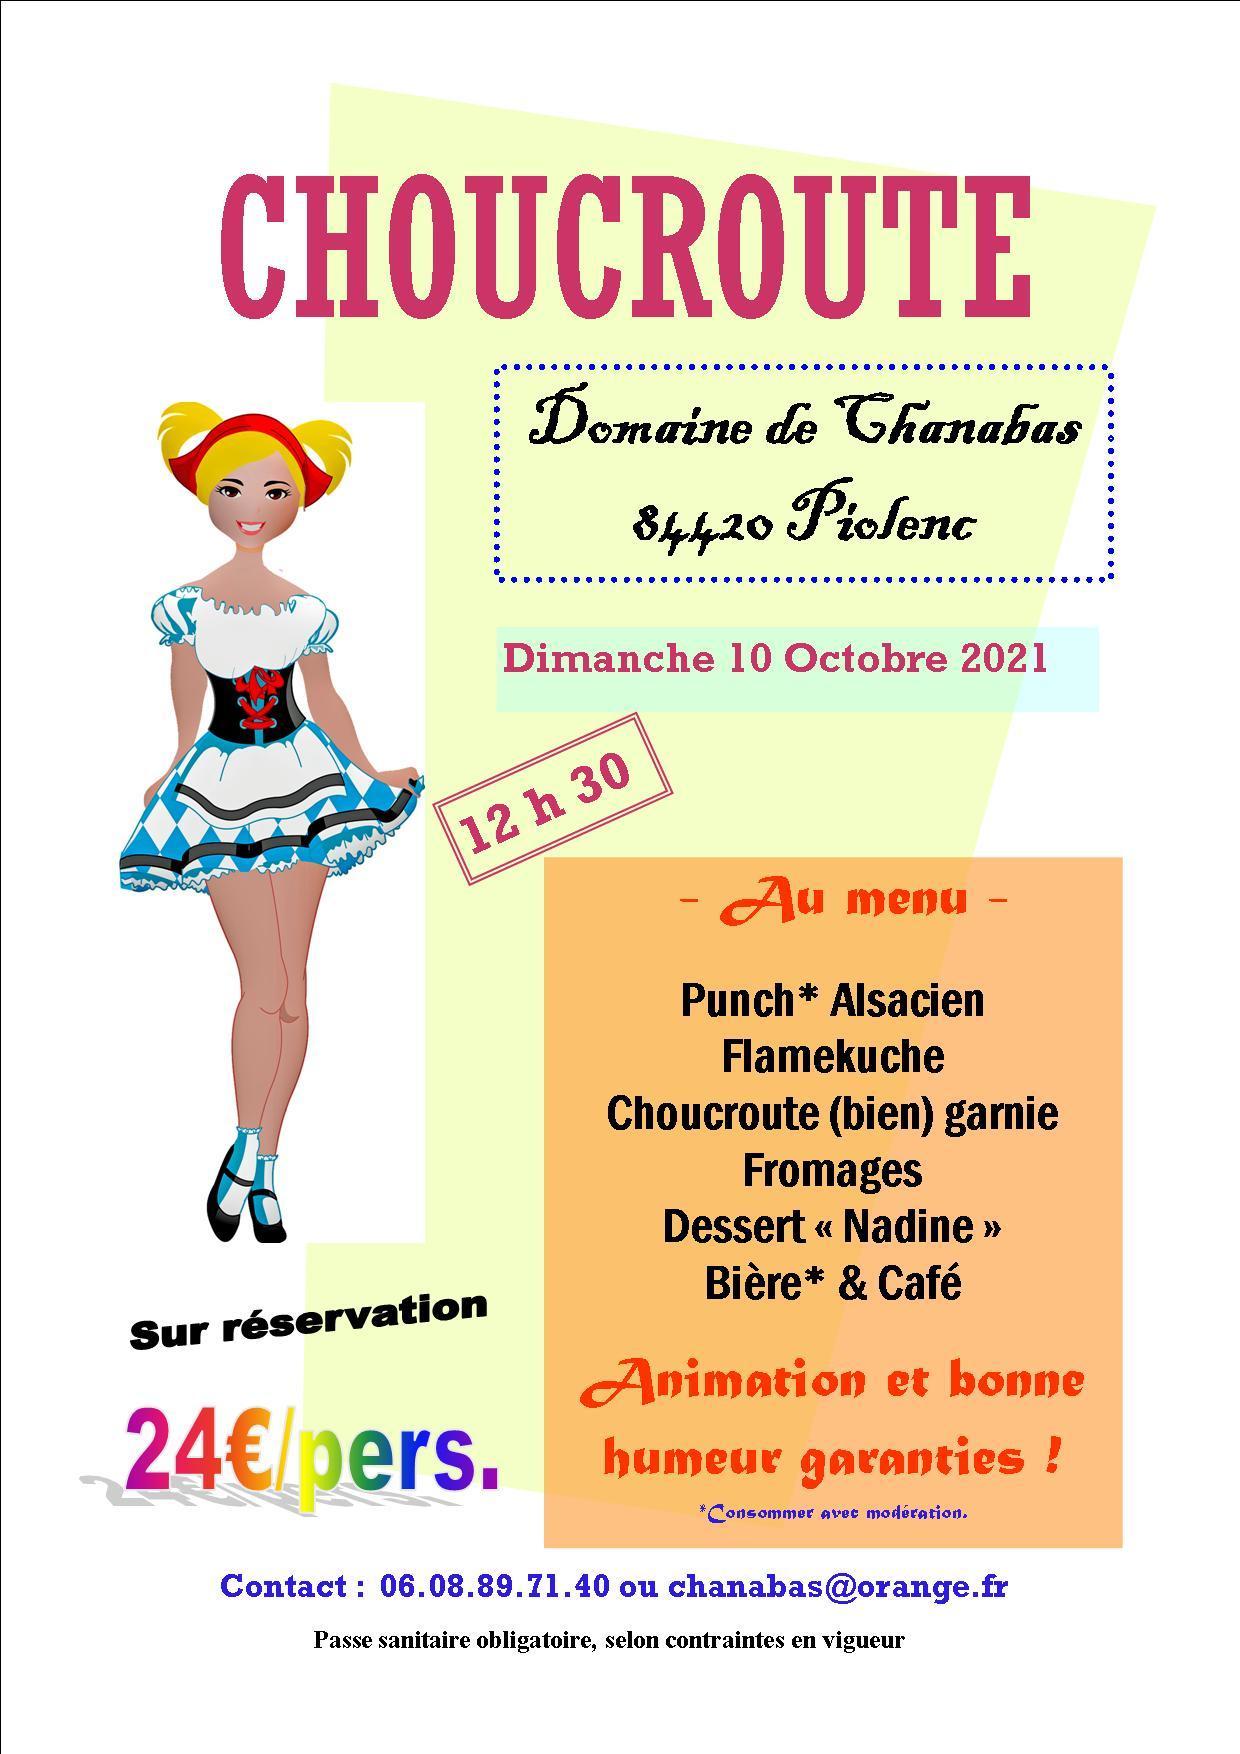 Choucroute 2022